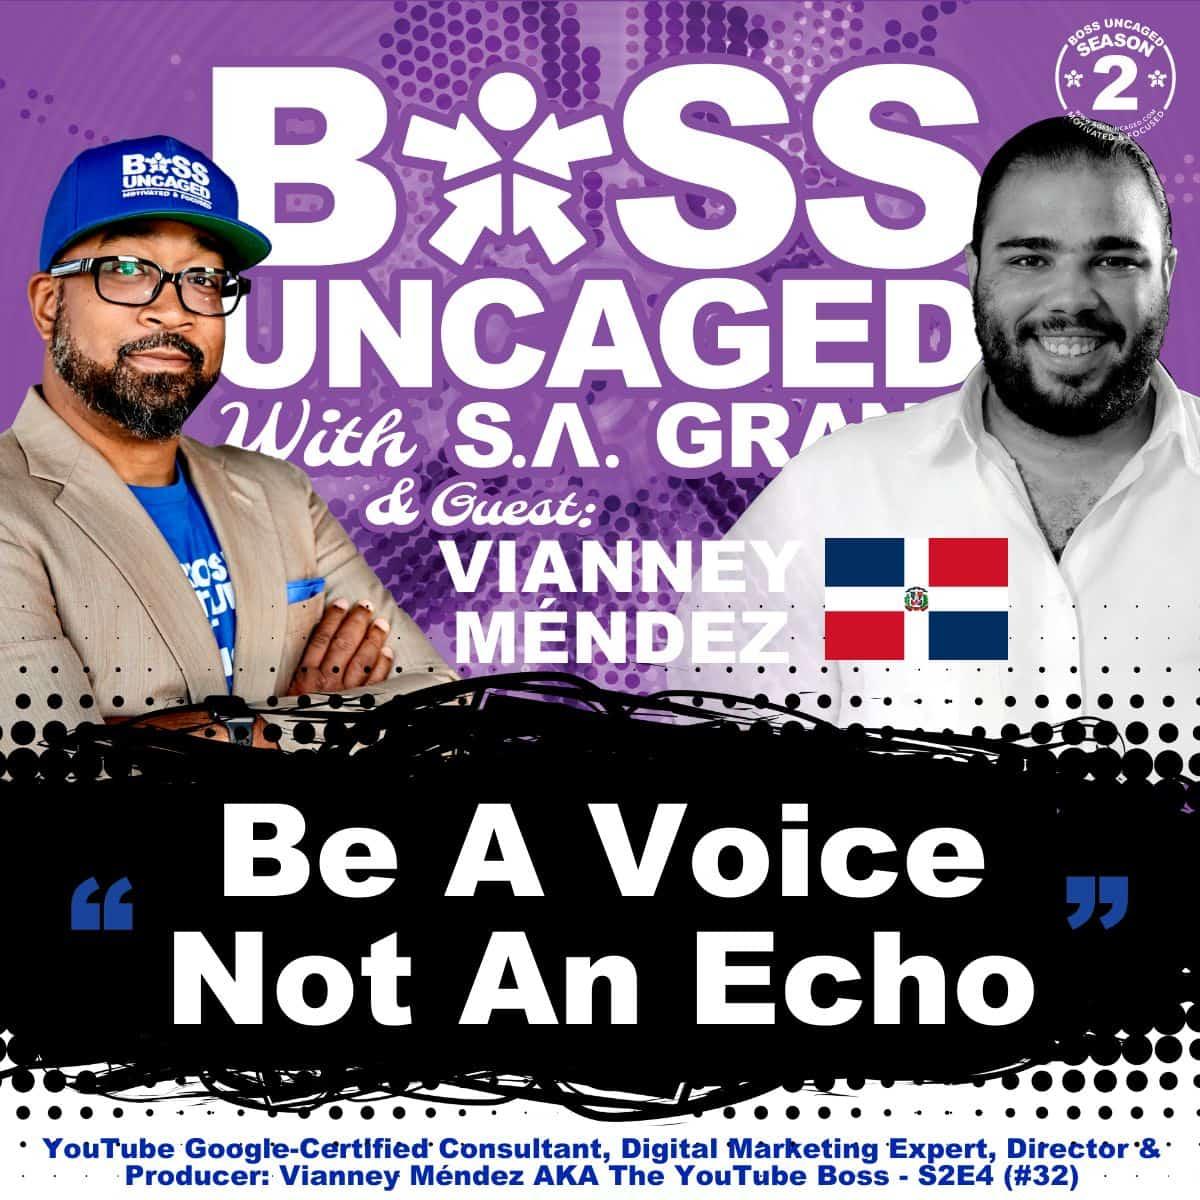 YouTube Google-Certified Consultant, Digital Marketing Expert, Director & Producer: Vianney Méndez AKA The YouTube Boss - S2E4 (#32)